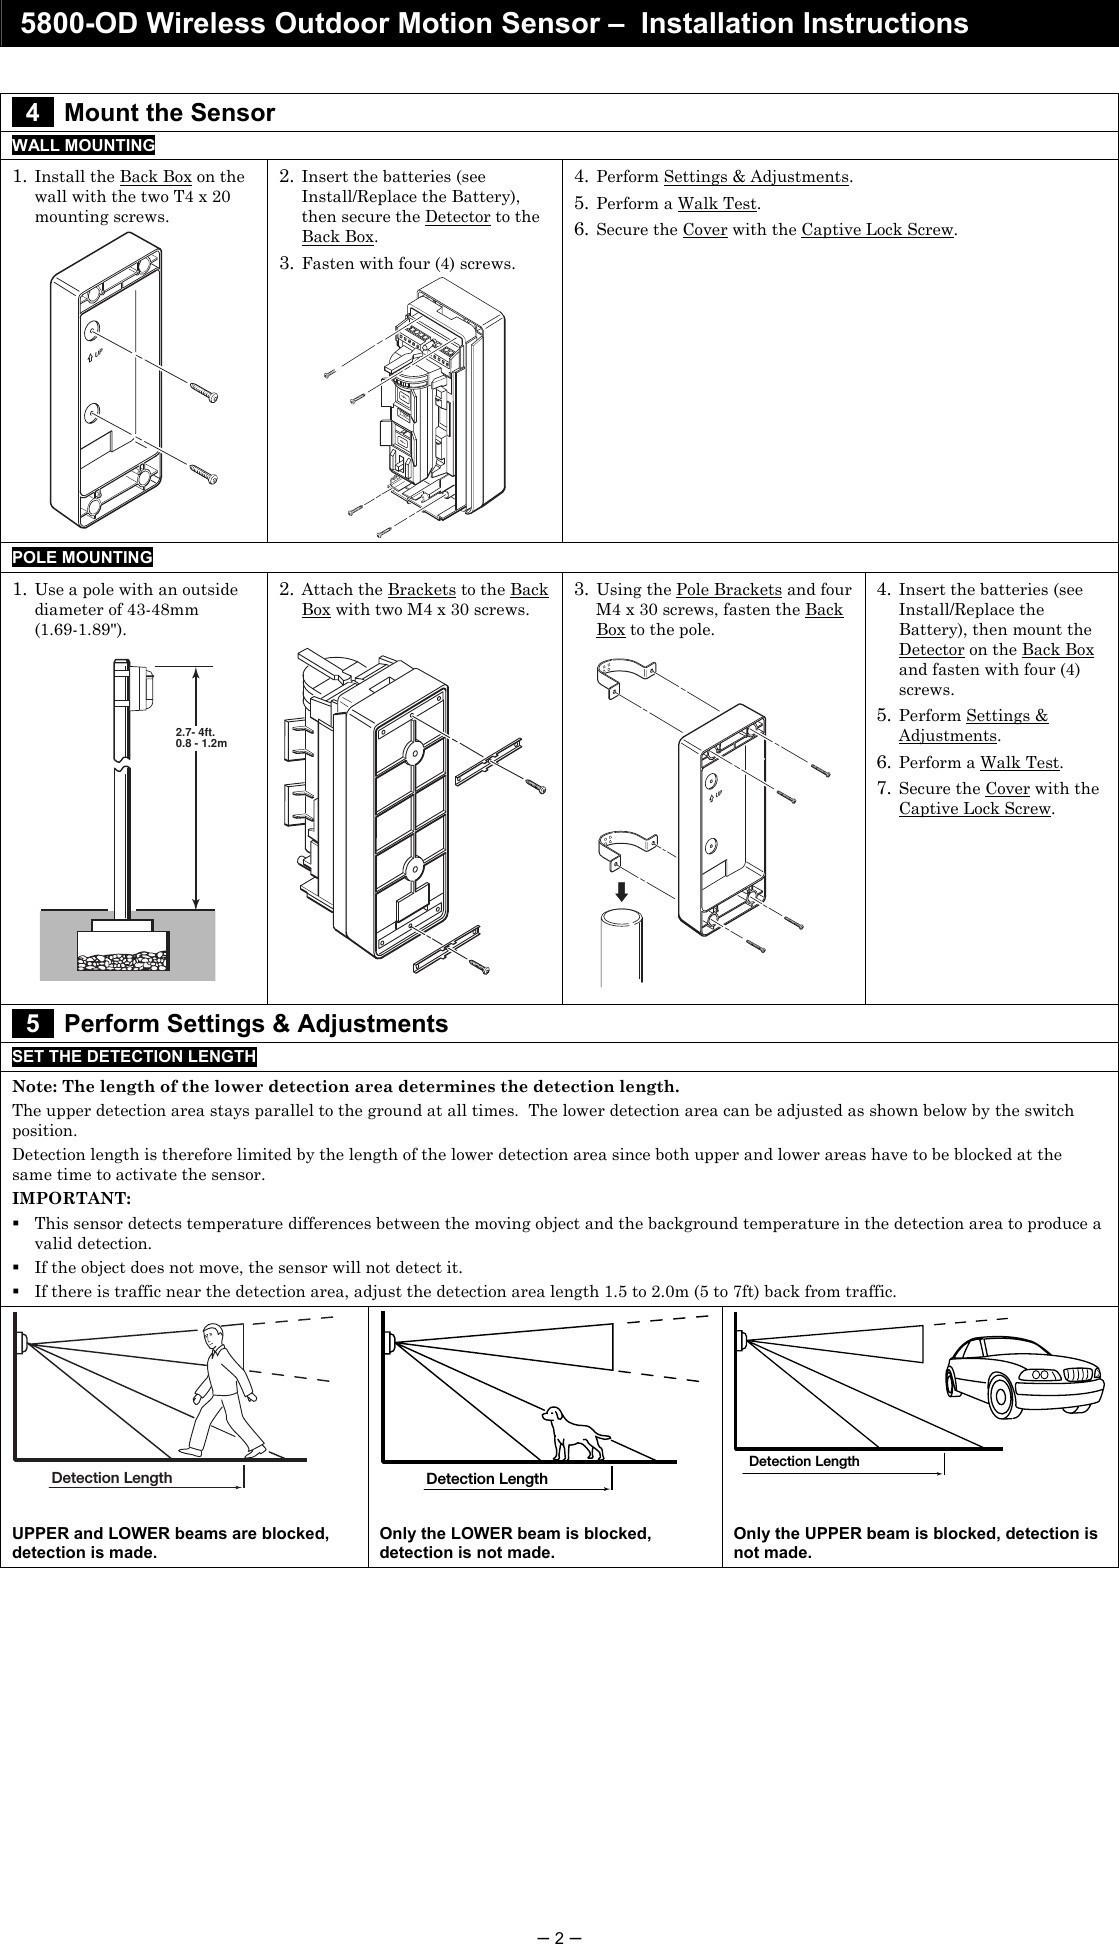 Car Alarm Circuit Diagram Wiring Diagram for Home Alarm ... on